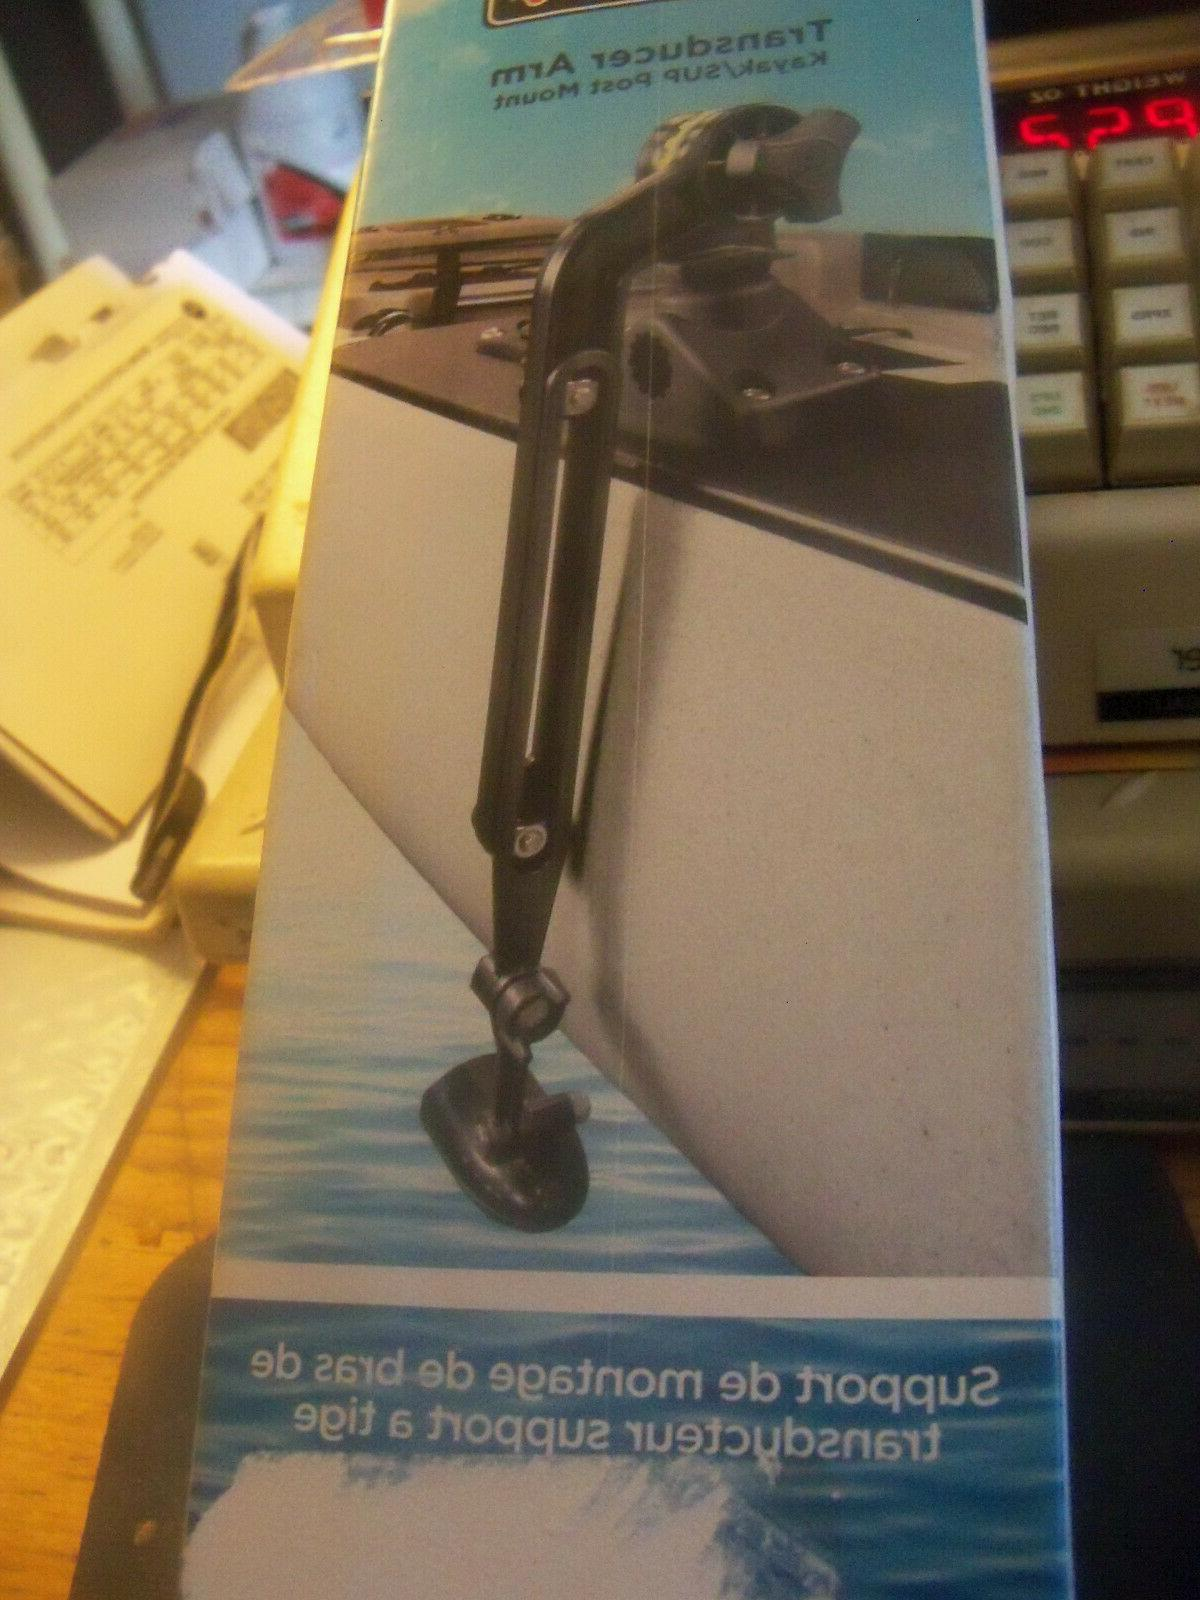 scotty kayak sup transducer mounting arm 140